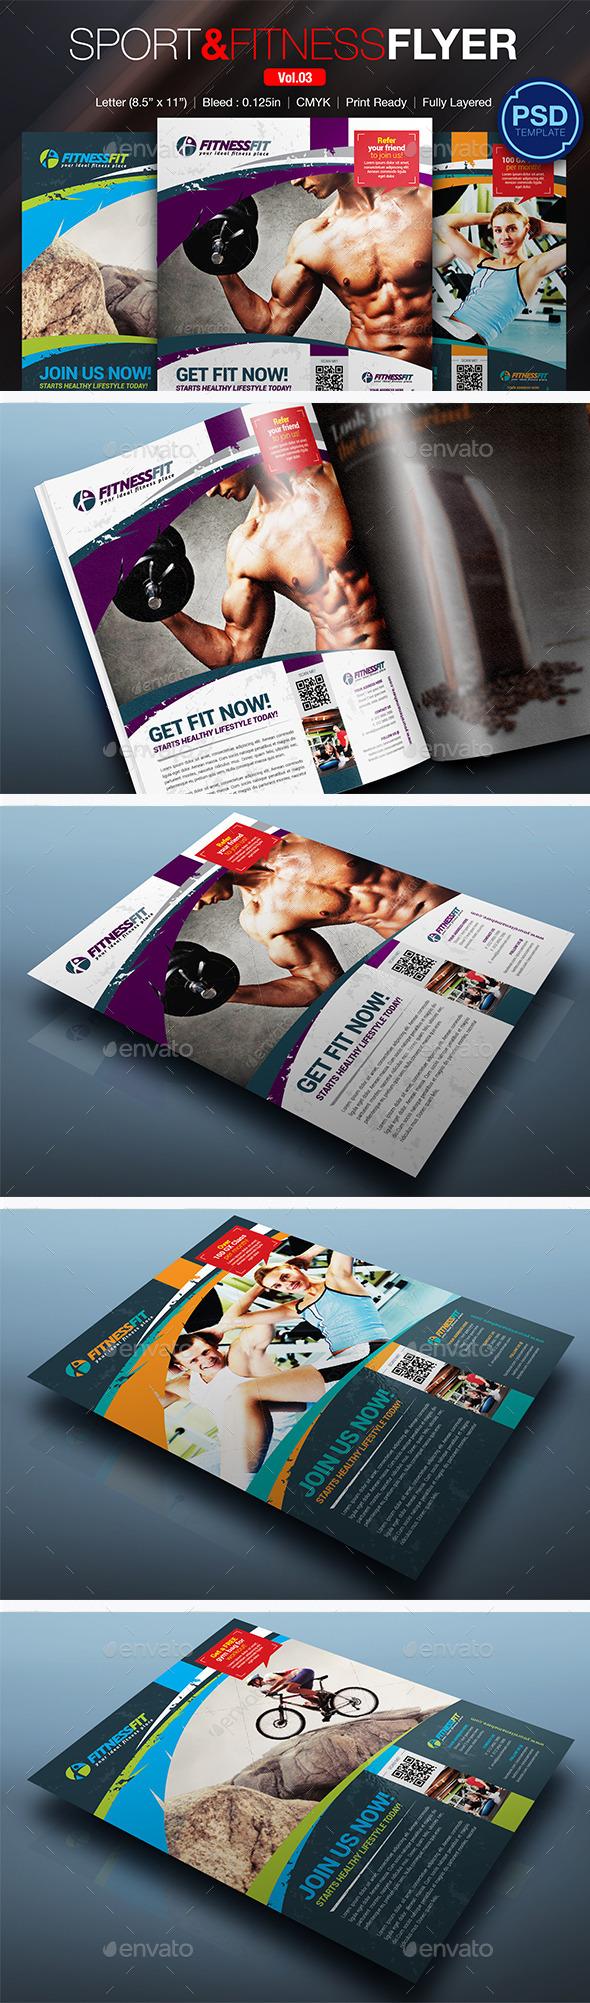 GraphicRiver Sport & Fitness Flyer Vol.03 10290209